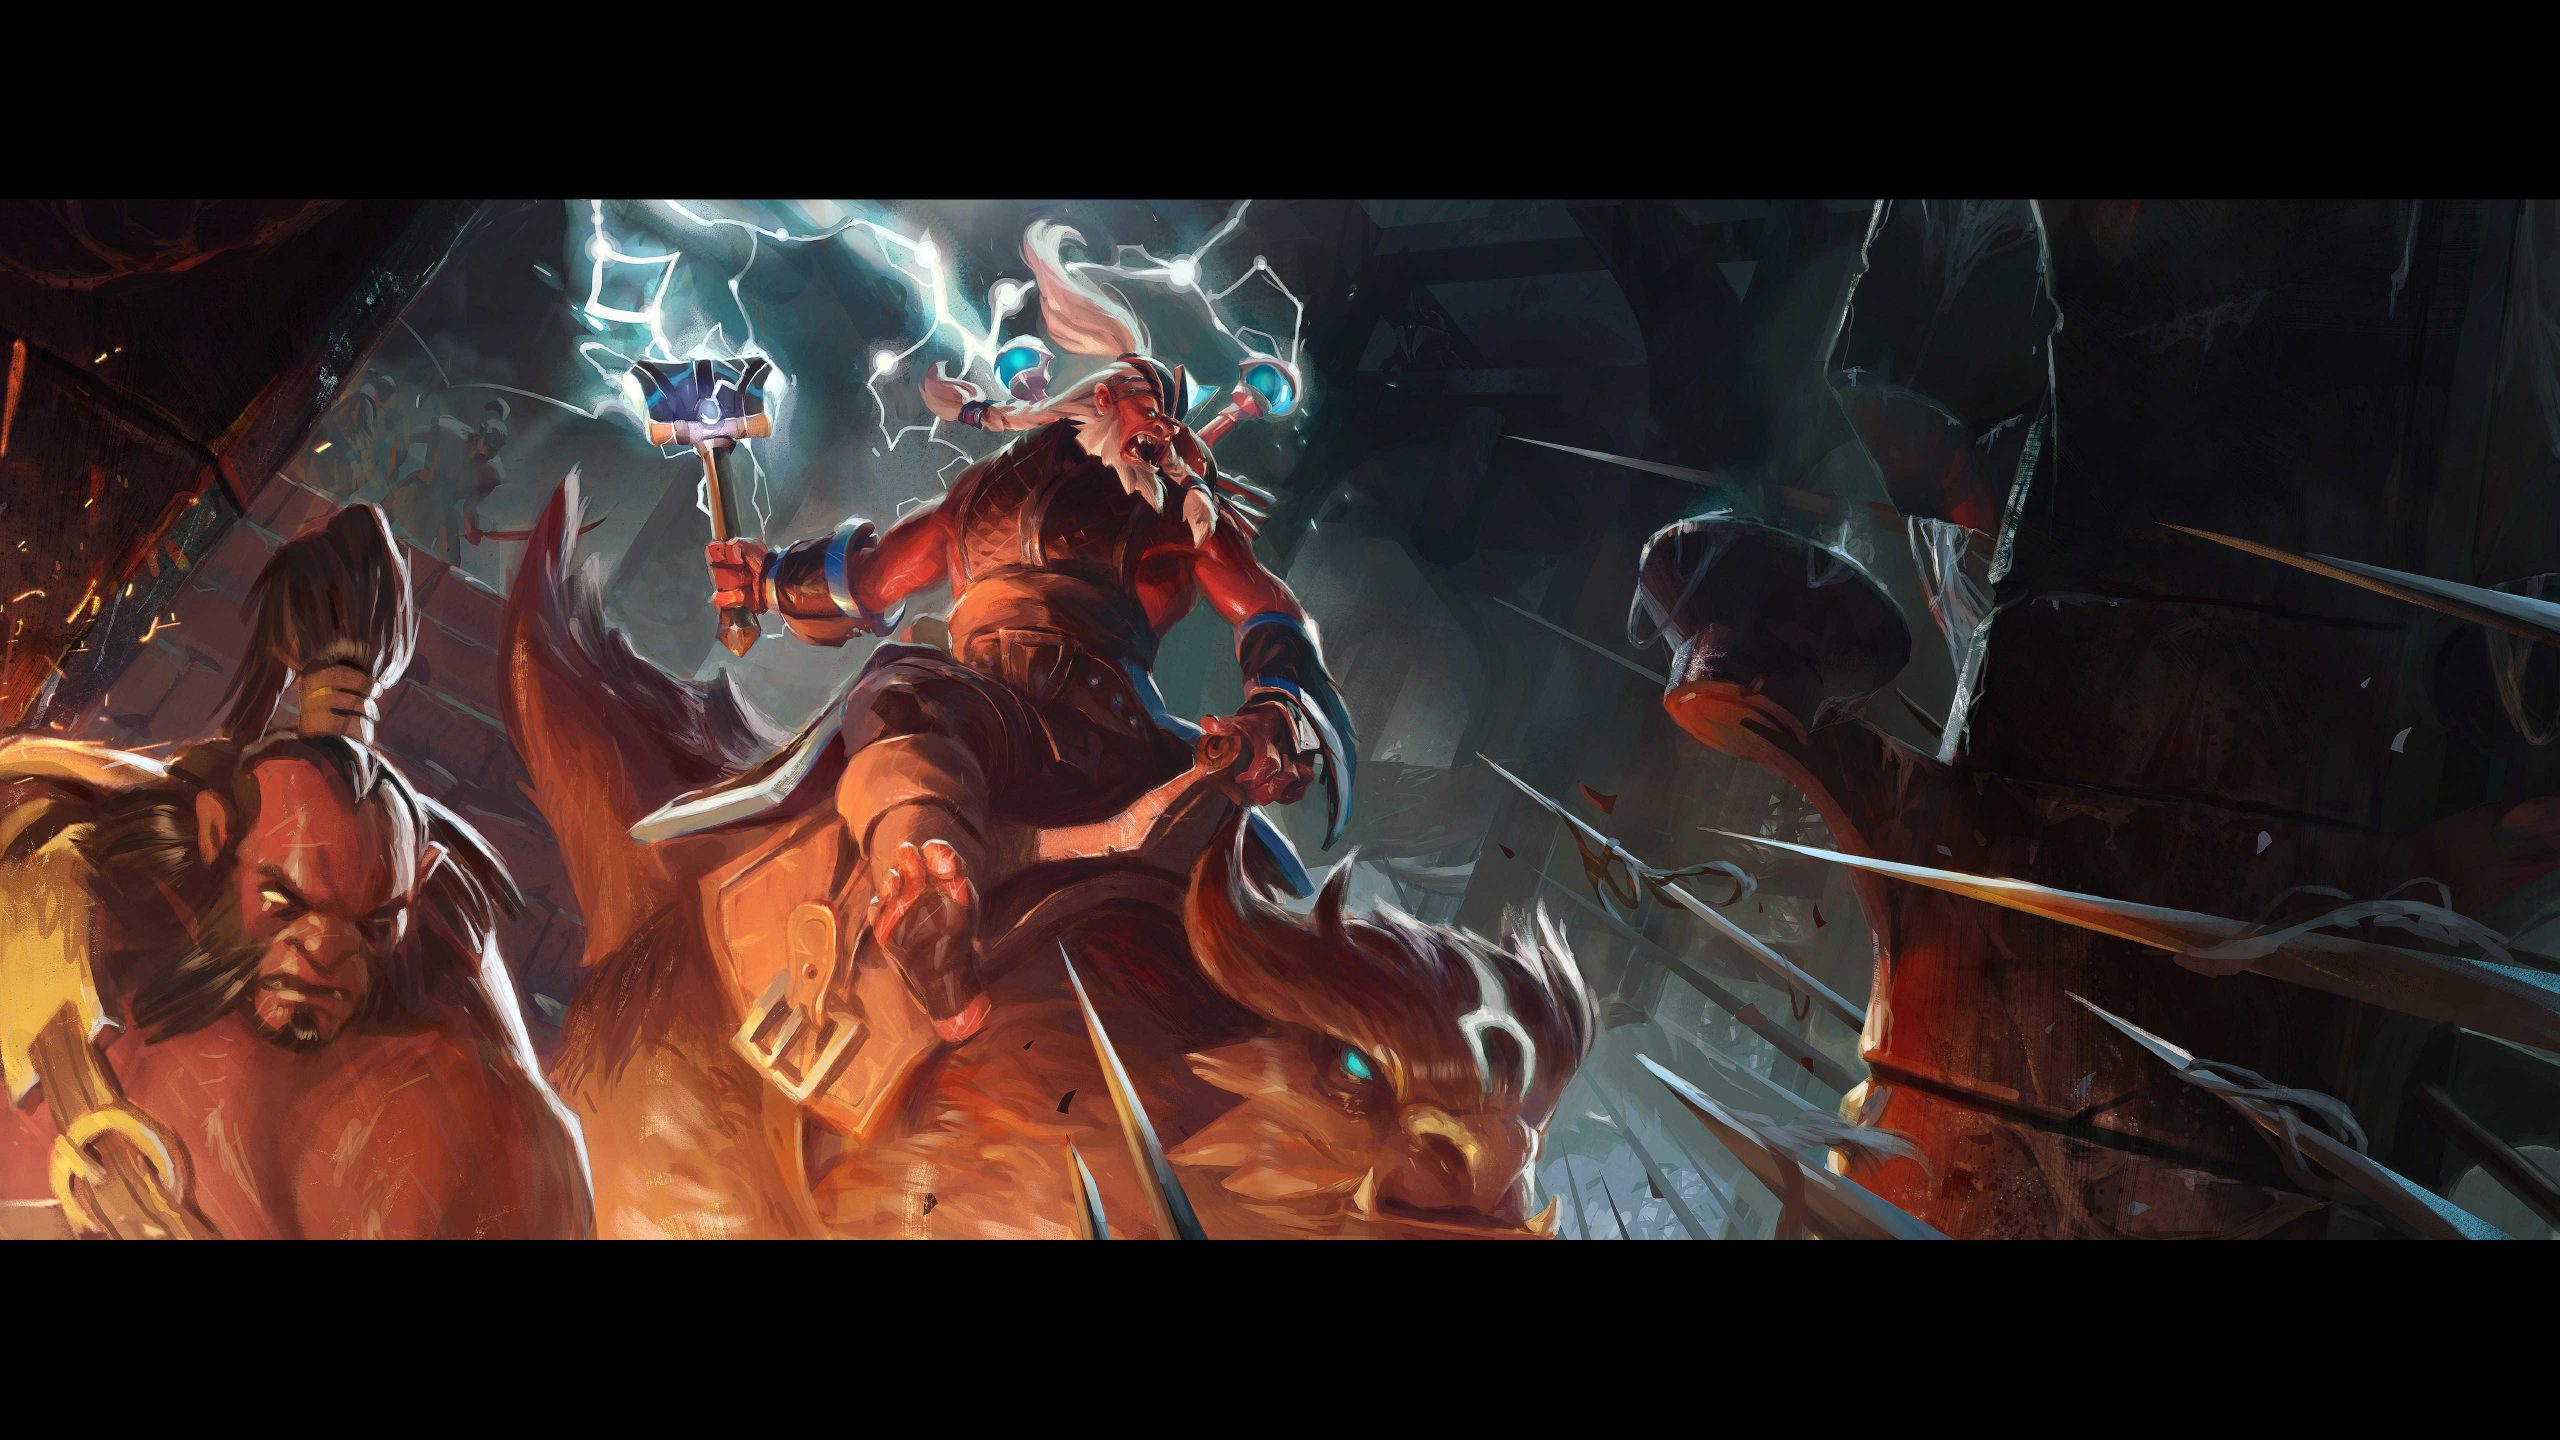 Juggernaut Dota 2 Hd Games 4k Wallpaper Image Background Photo And Picture 4k